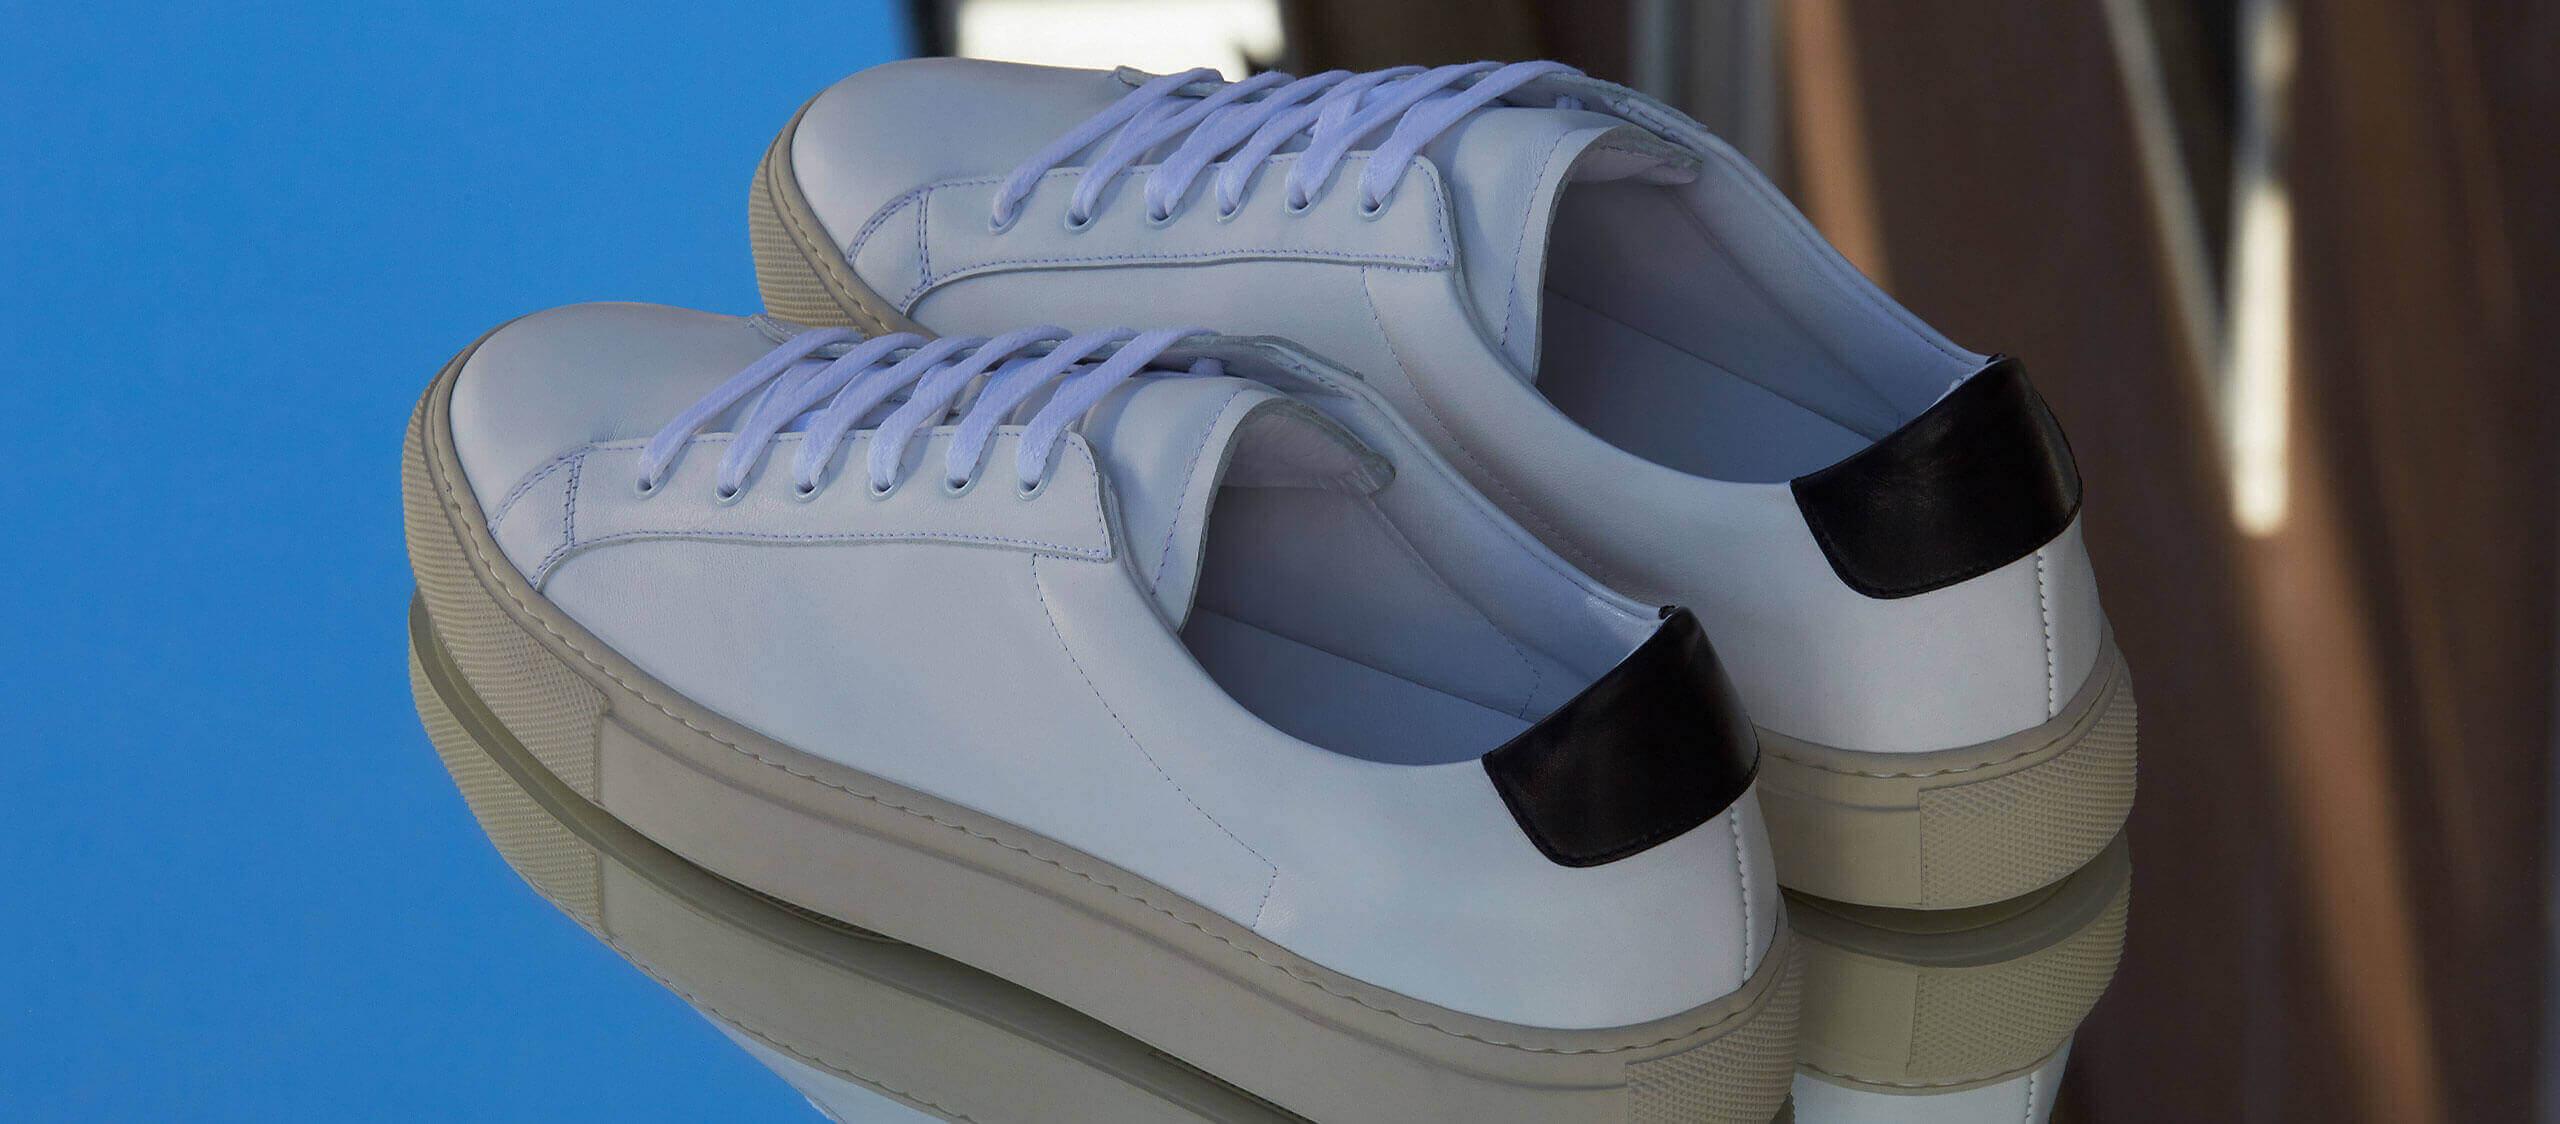 850c837445 Scarosso - Luxury Italian shoes for Men and Women